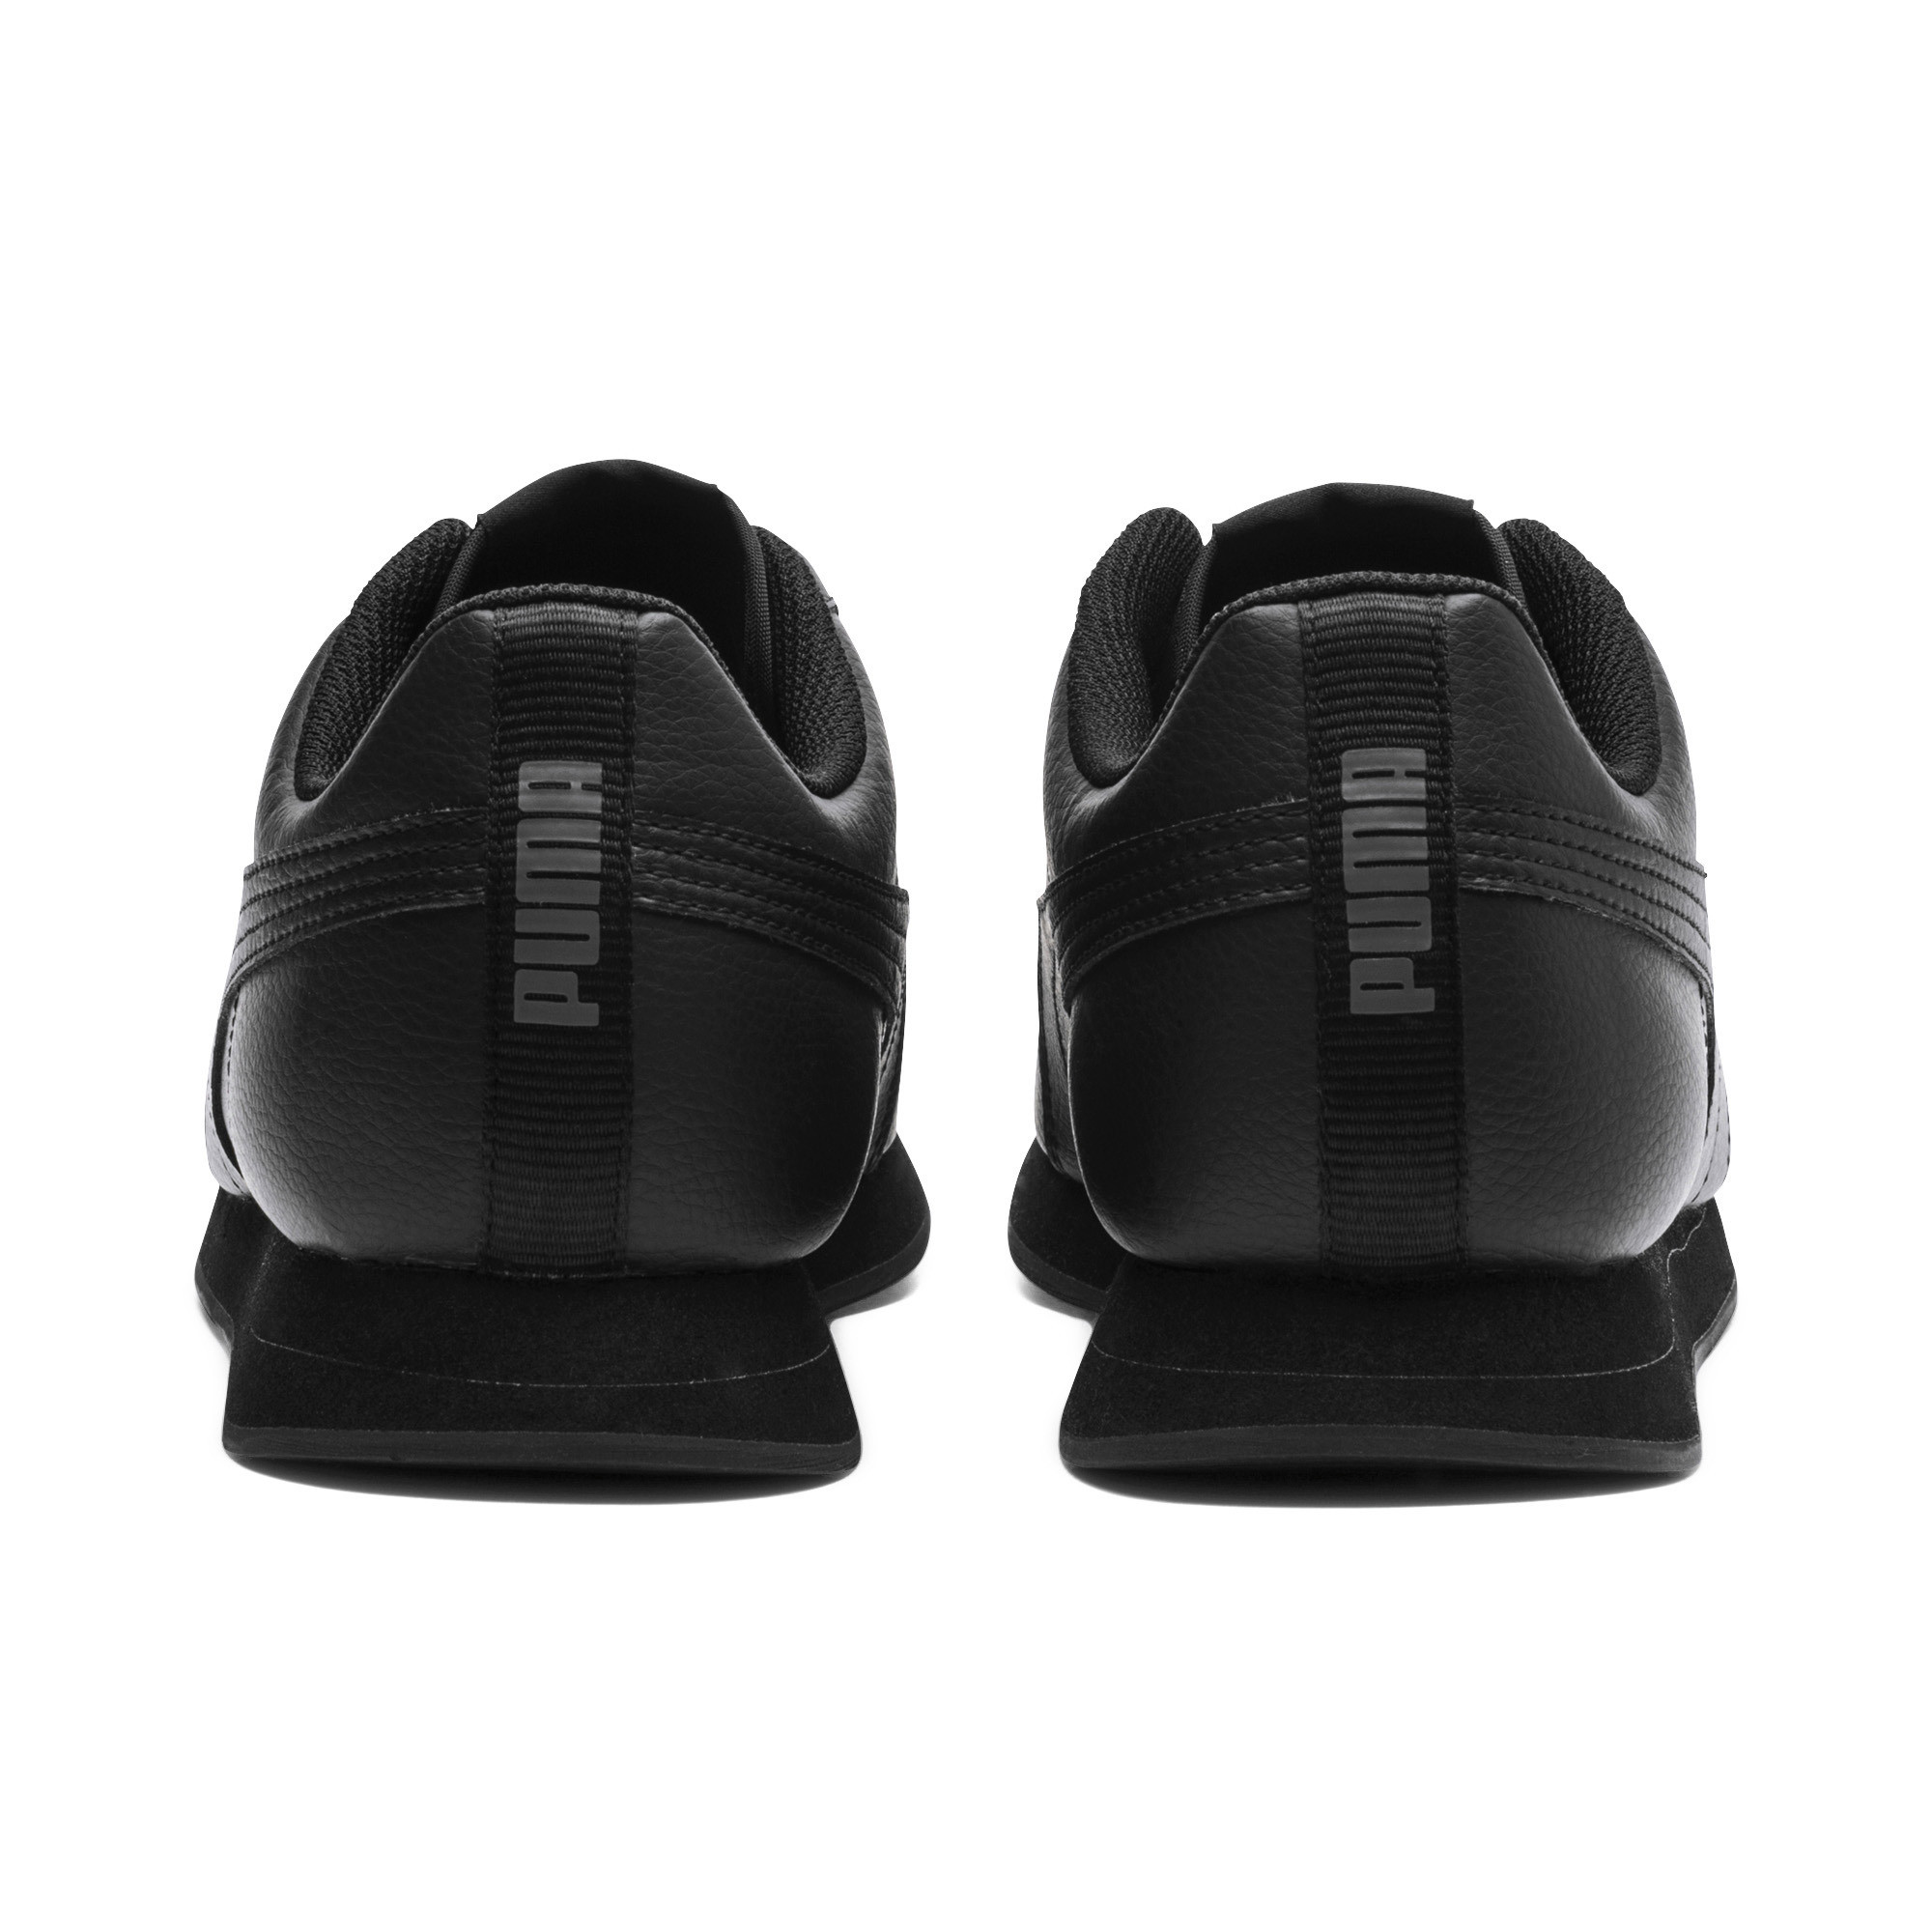 PUMA-Men-039-s-Turin-II-Sneakers thumbnail 3